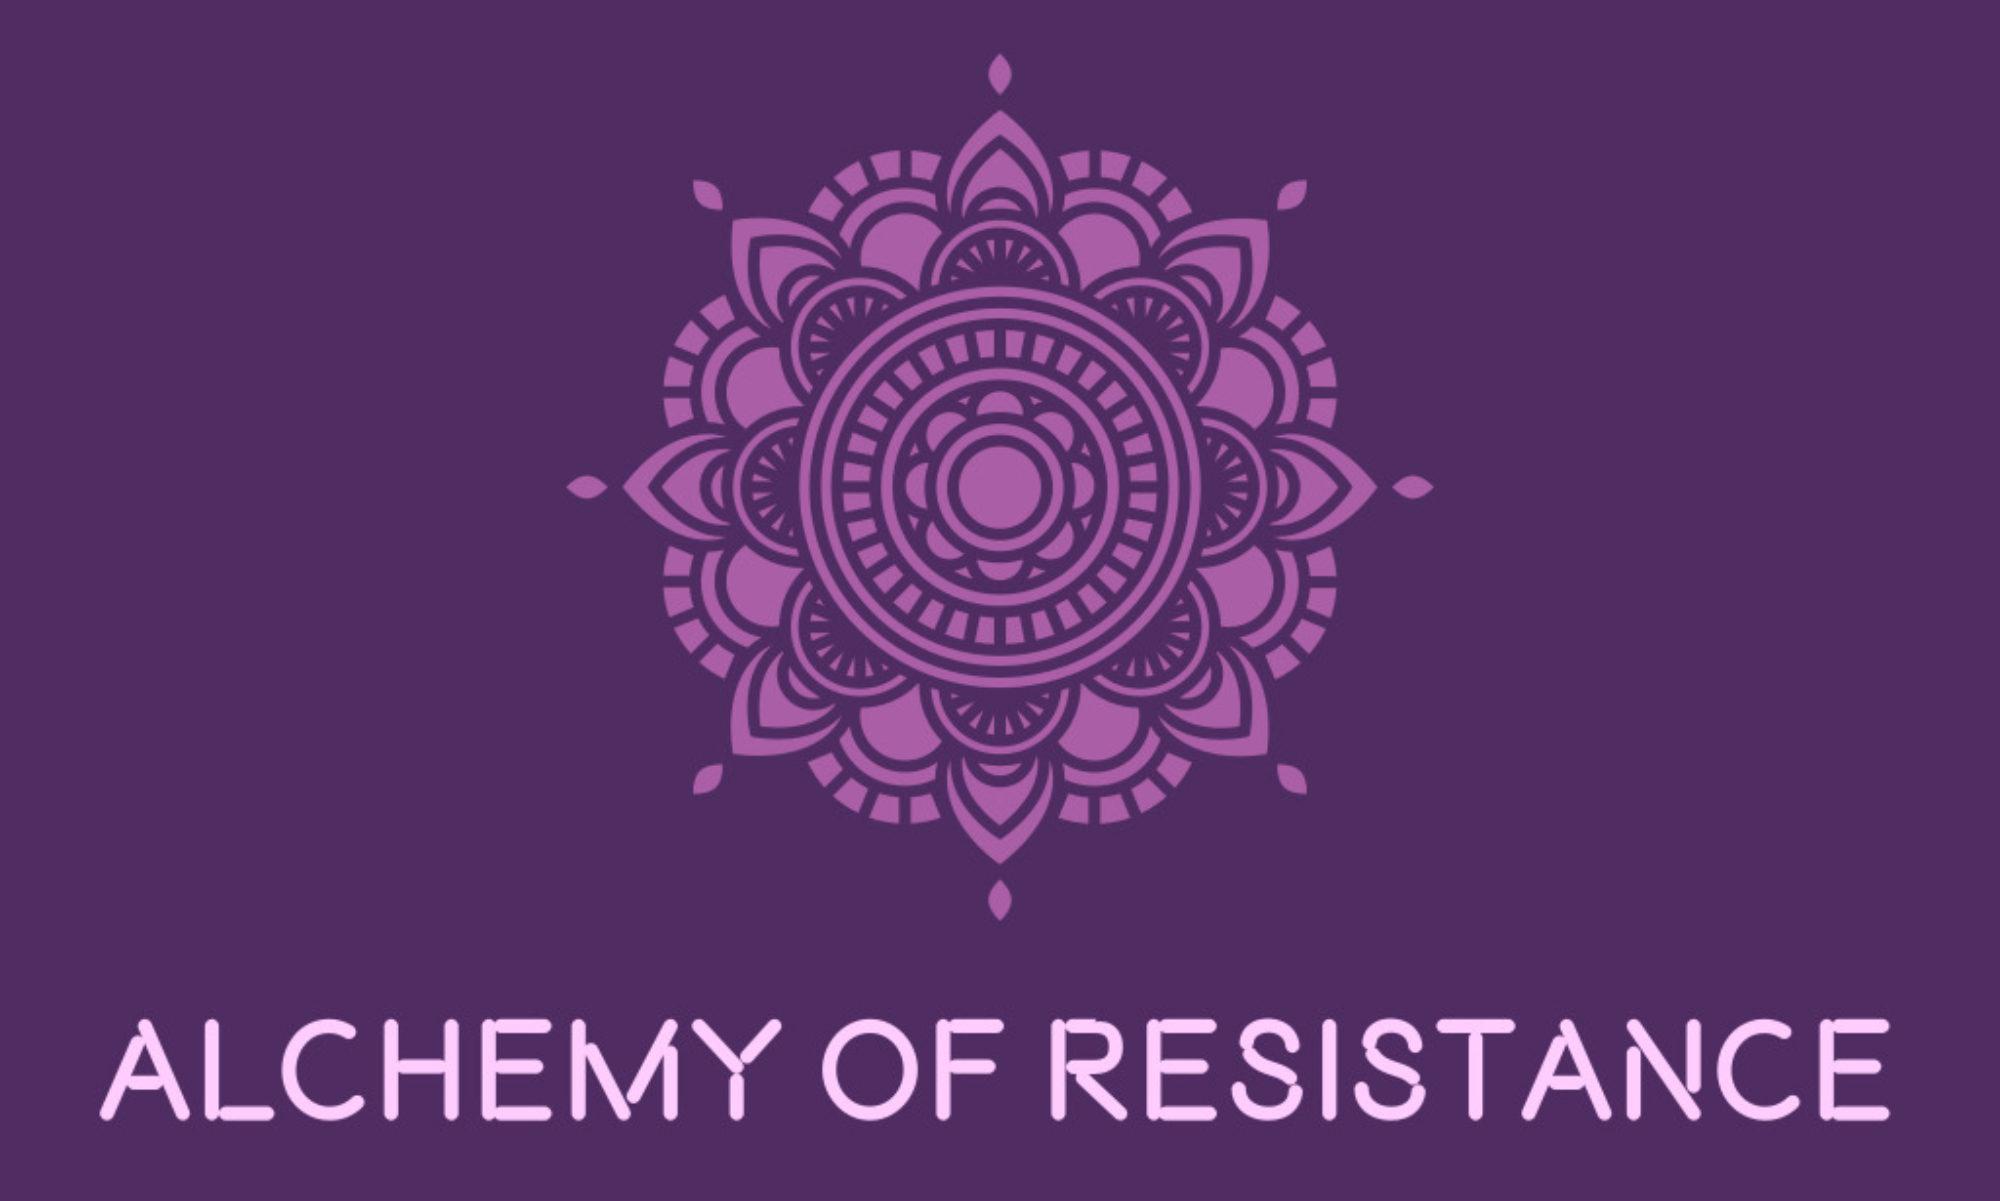 Alchemy of Resistance